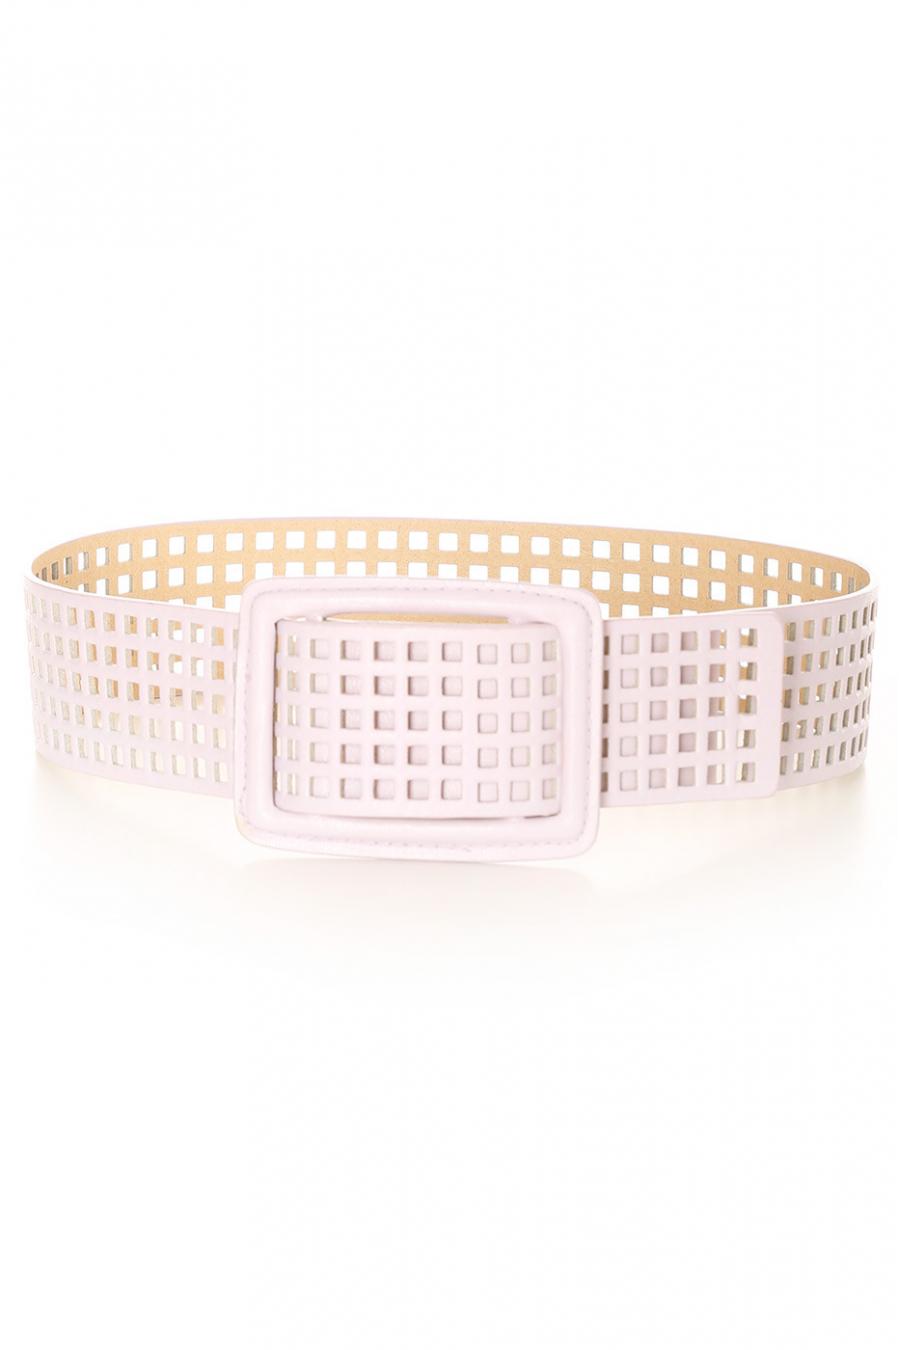 Parma grid belt with holes. SG-0452